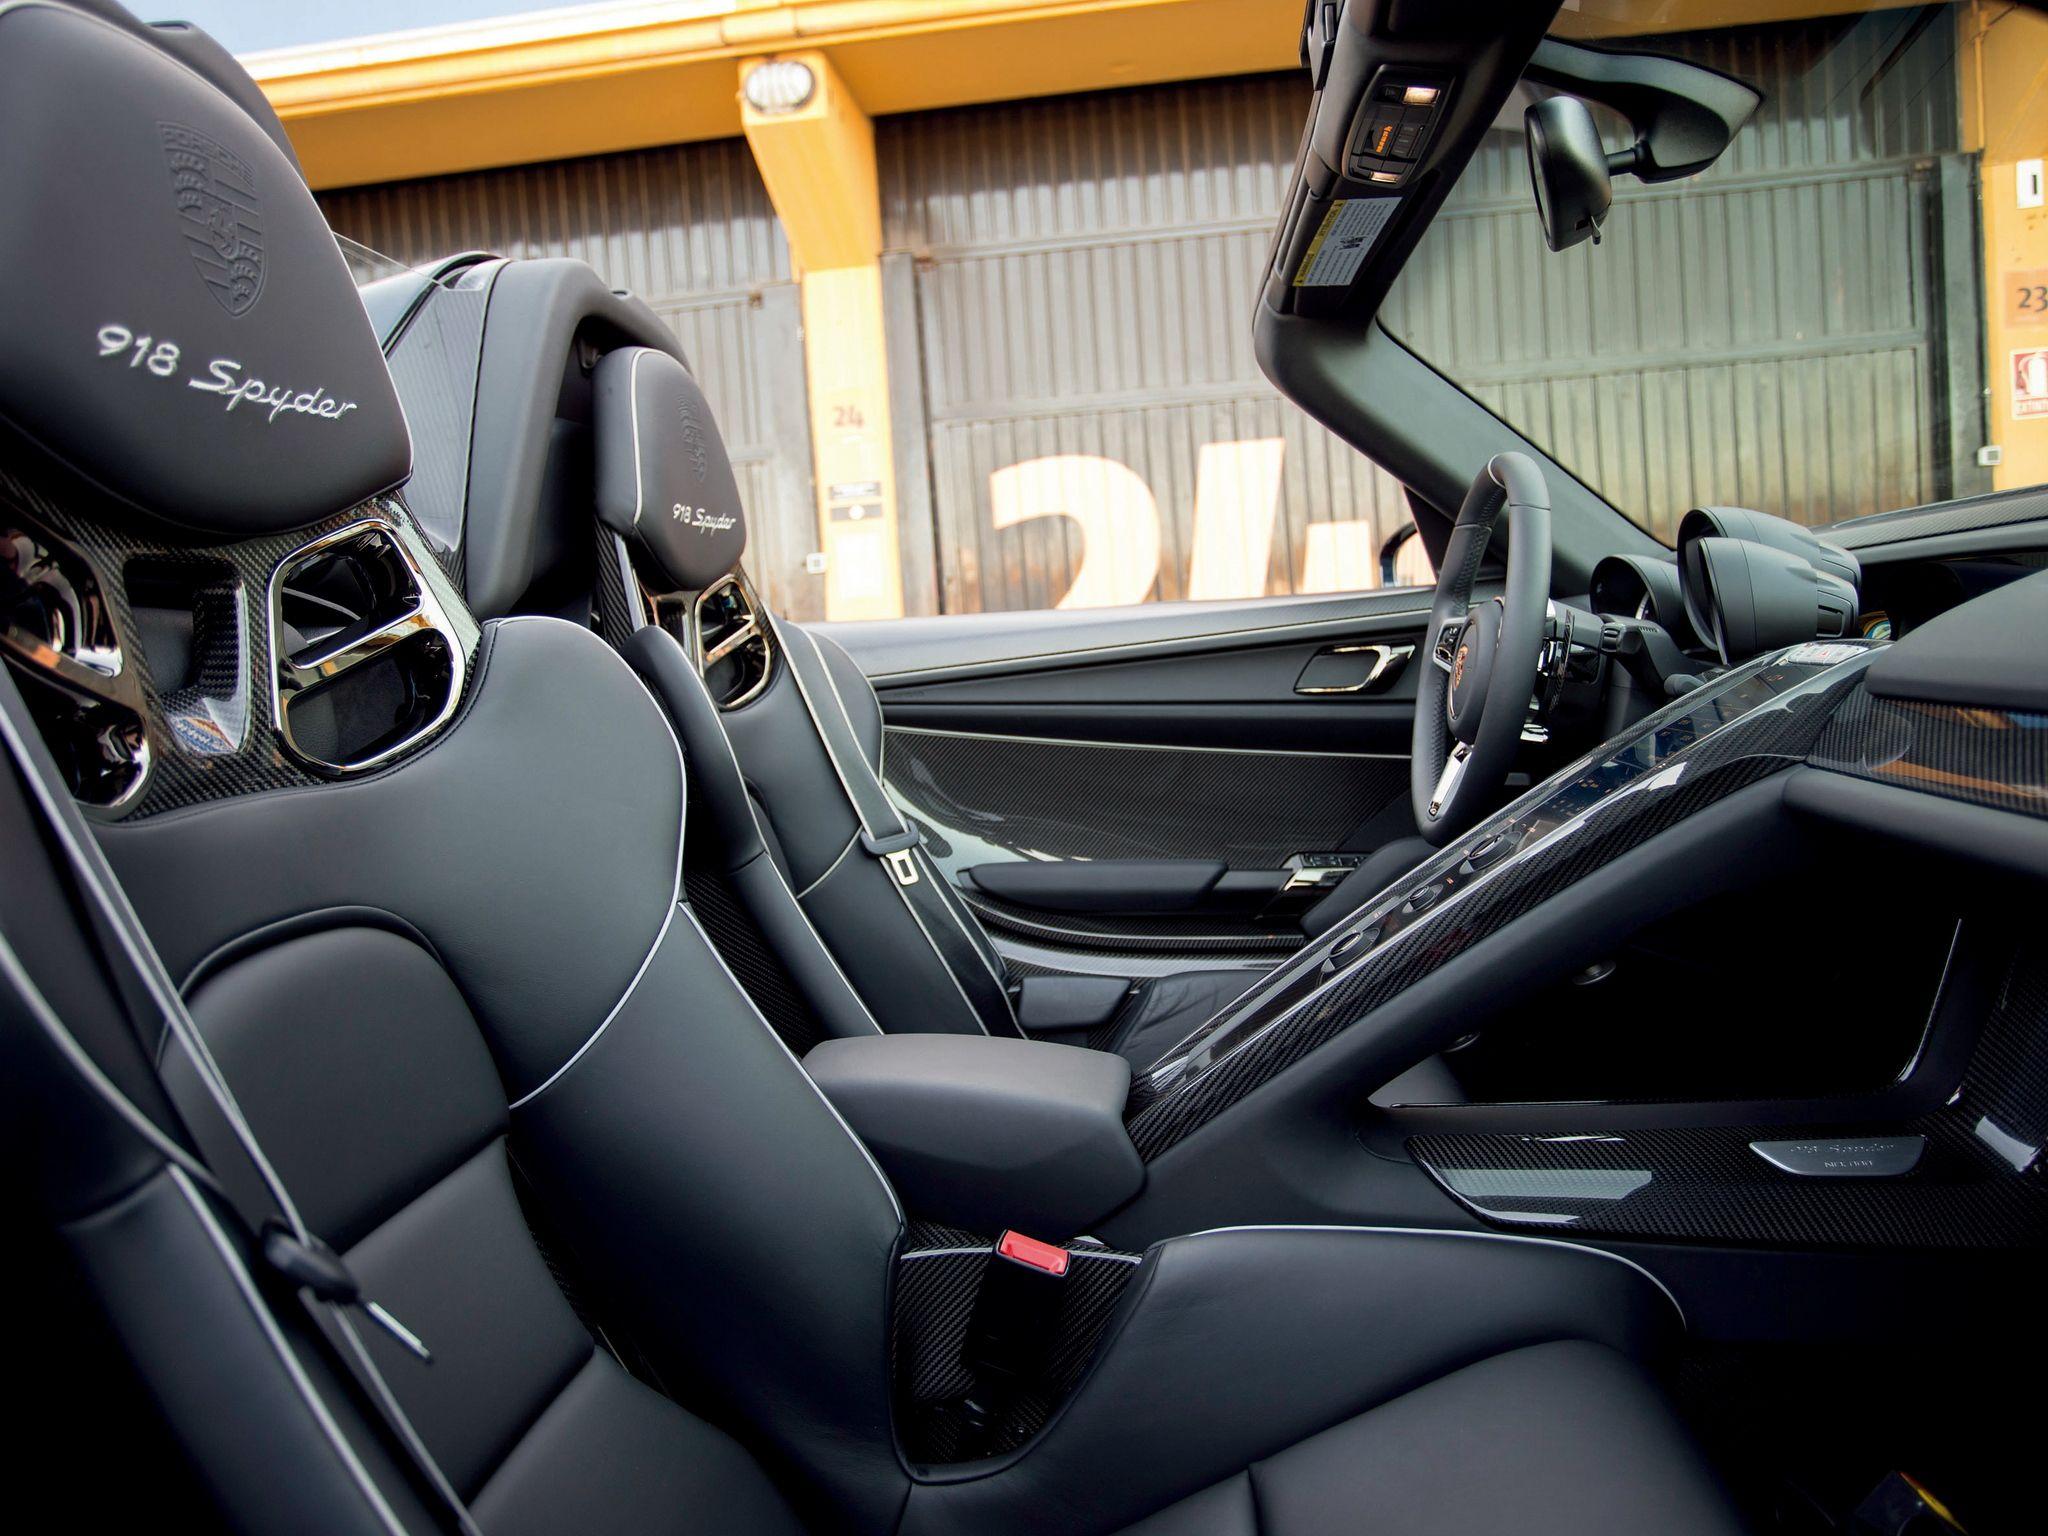 14950556a6660c0eaeb96cd5f657124d Marvelous Porsche 918 Spyder Hybrid Prezzo Cars Trend